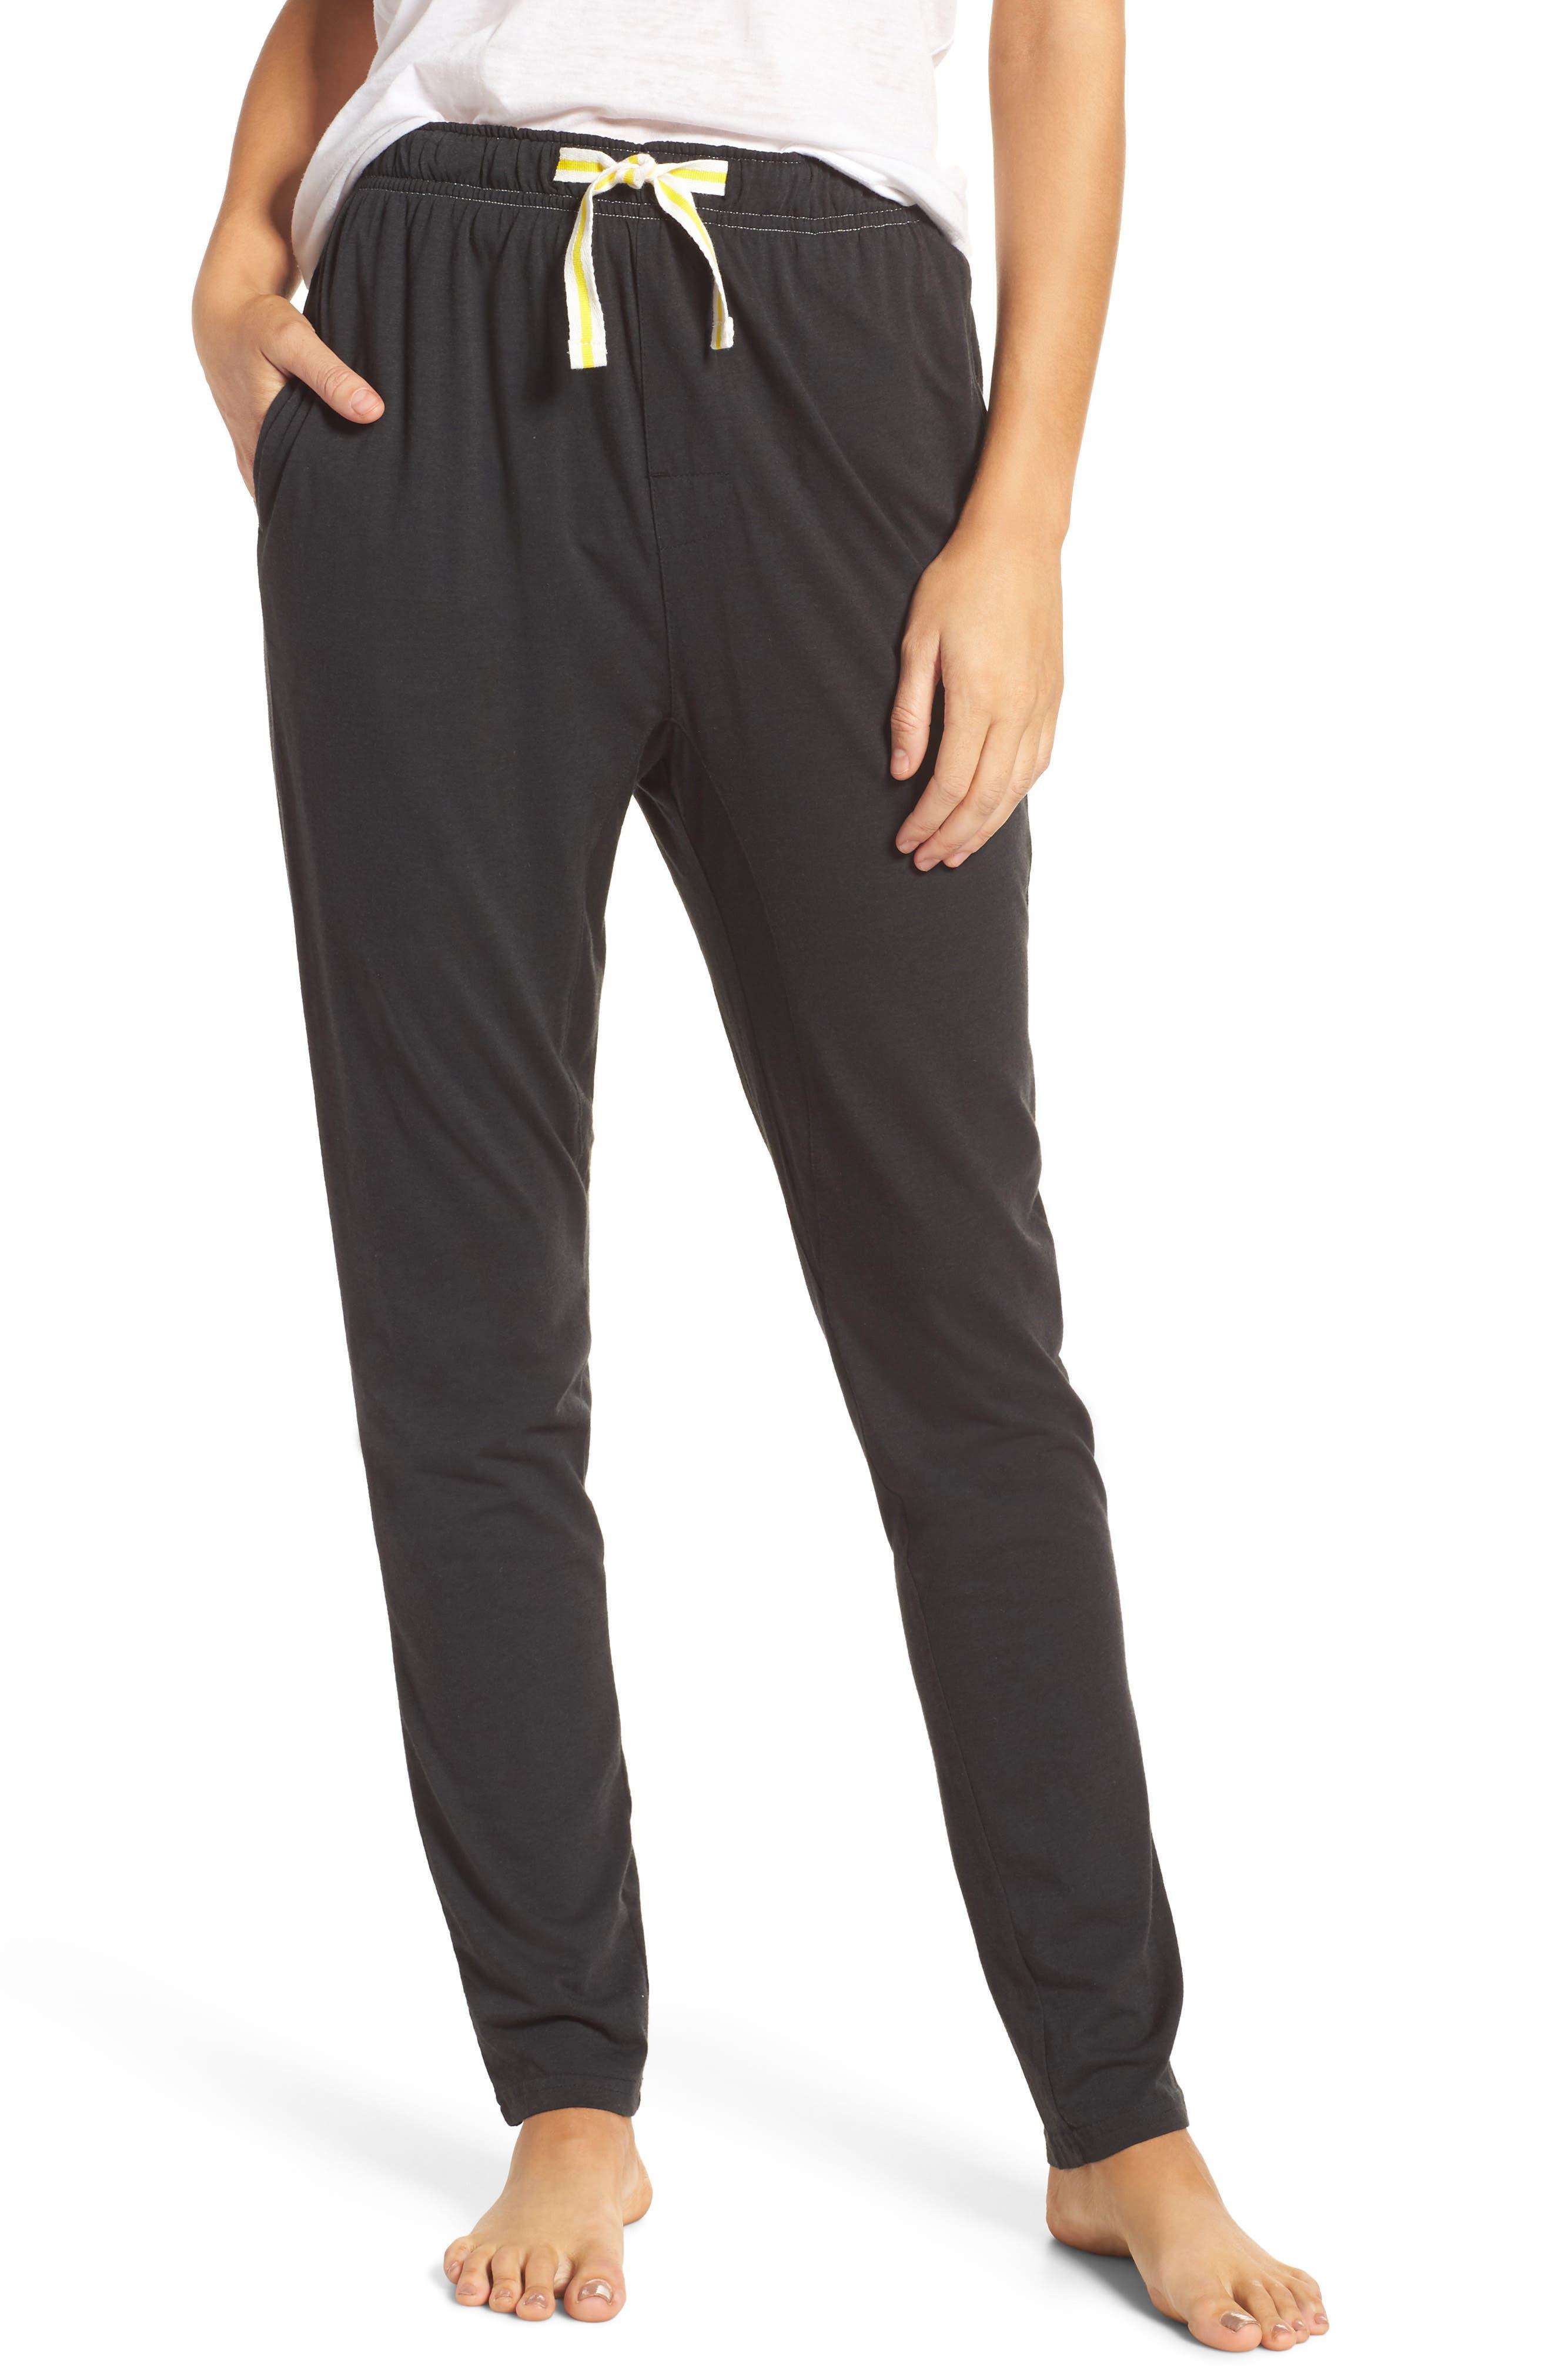 Alice Lounge Pants,                         Main,                         color, Plain Black Marle